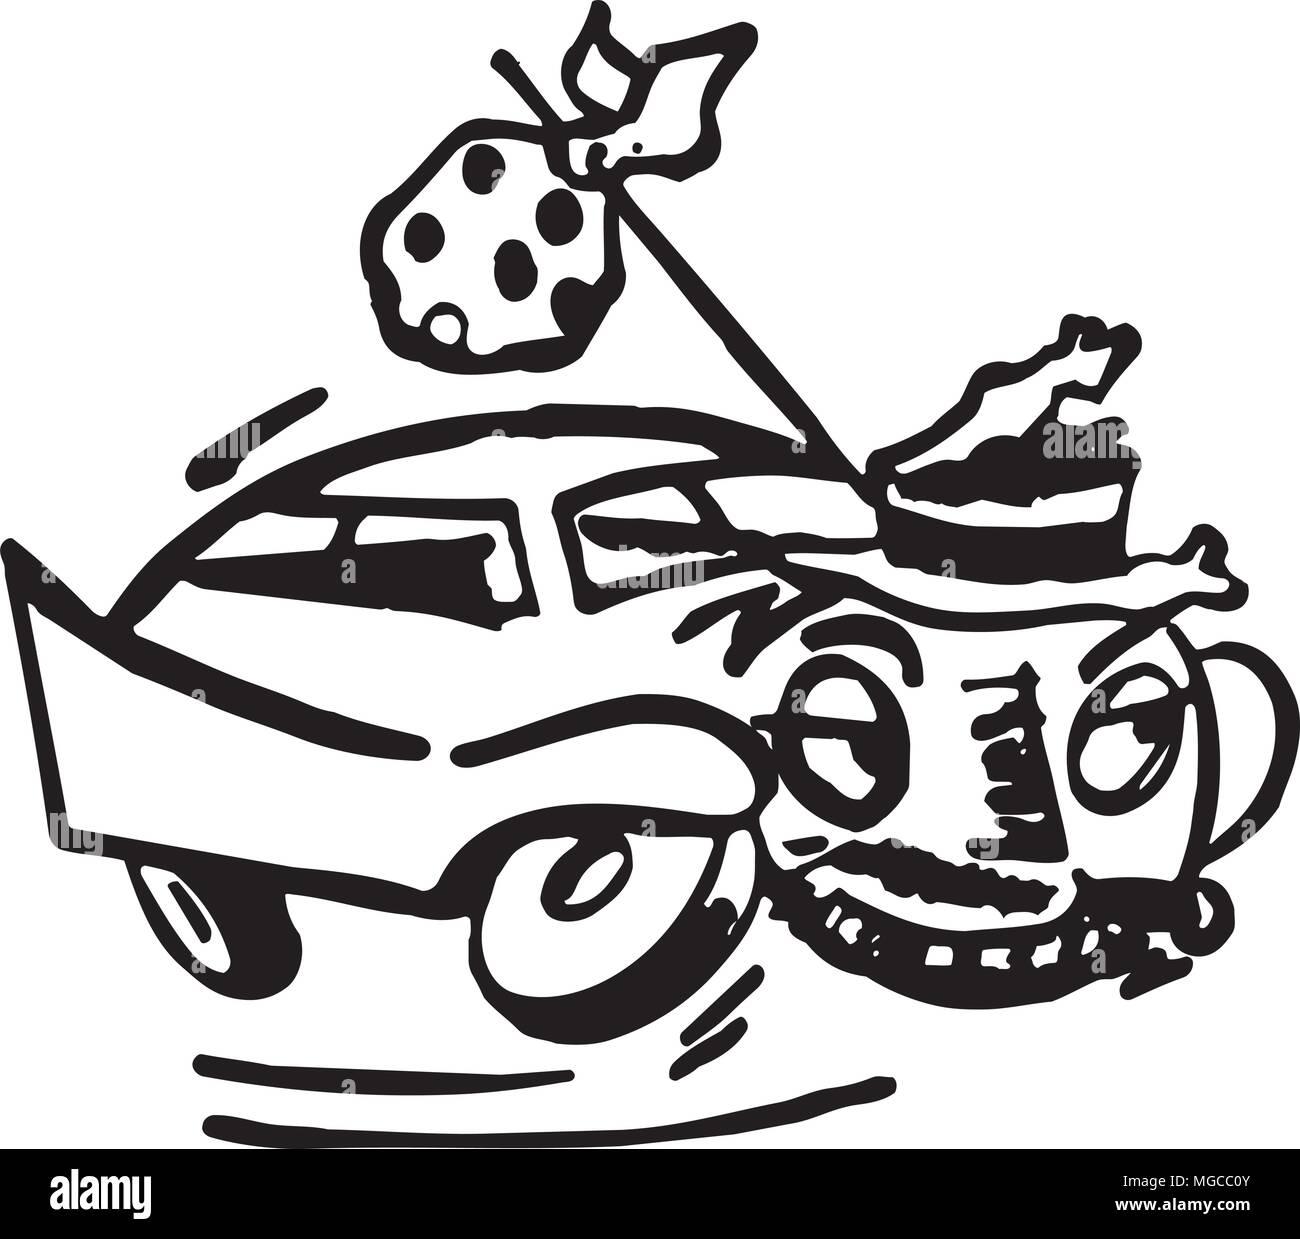 Runaway Stock Vector Illustration And Royalty Free Runaway Clipart